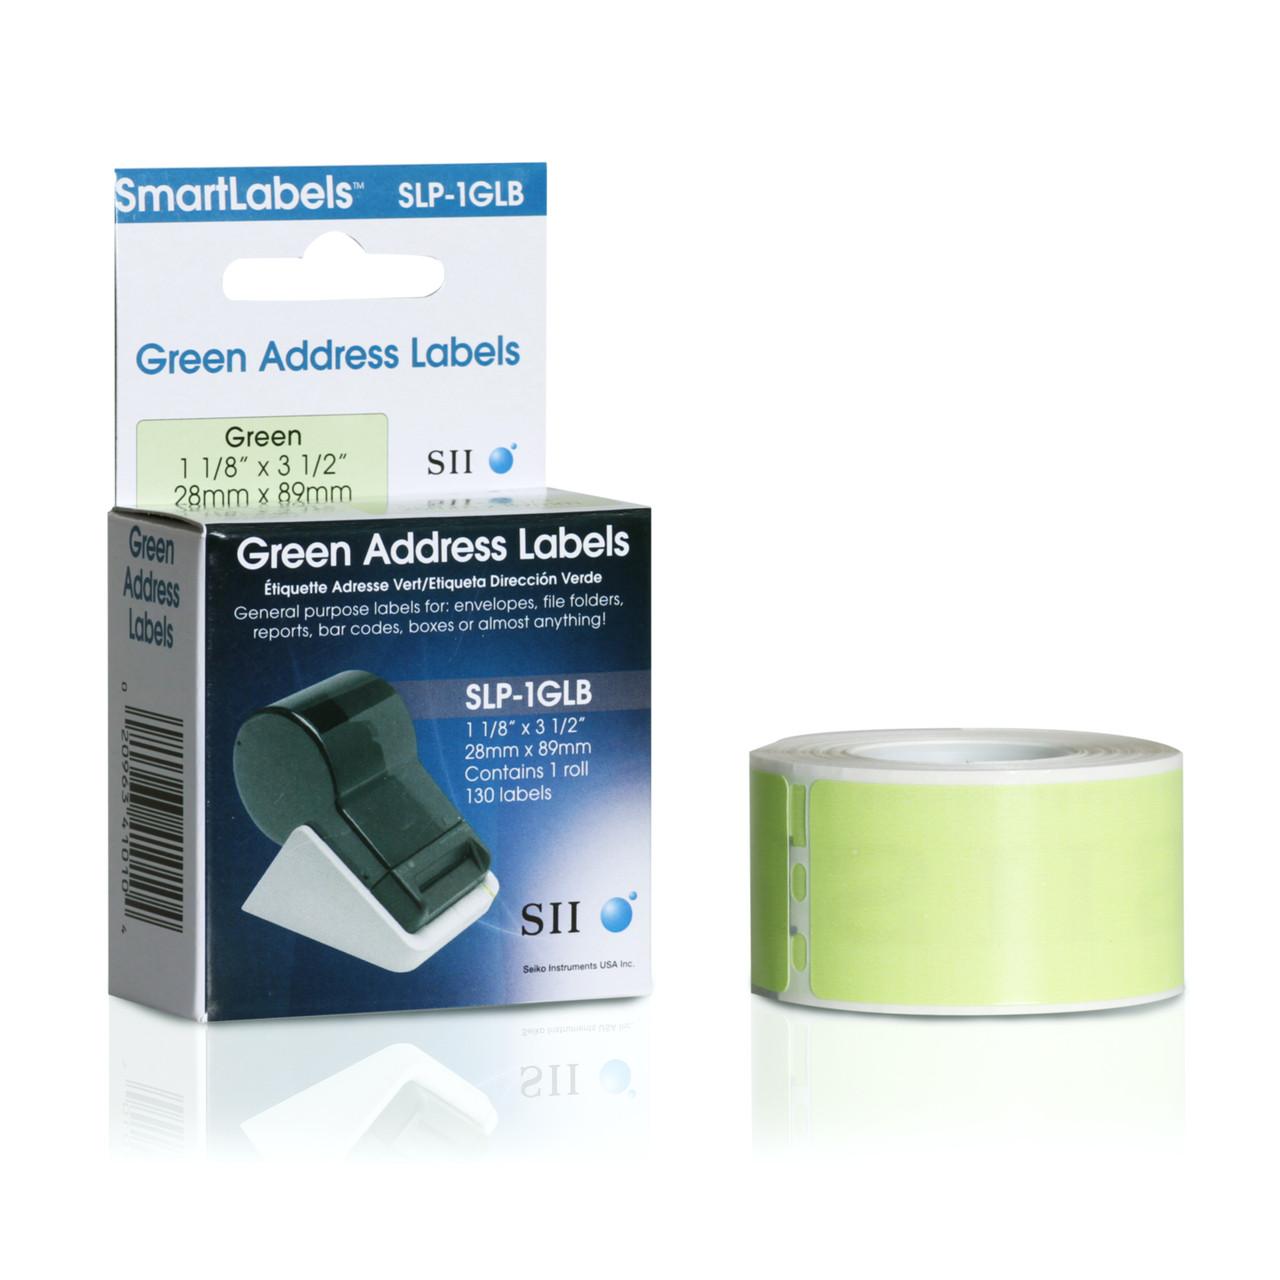 Seiko SLP620/650 1.125 x 3.5 Green Address Inkjet Labels SLP-1GLB